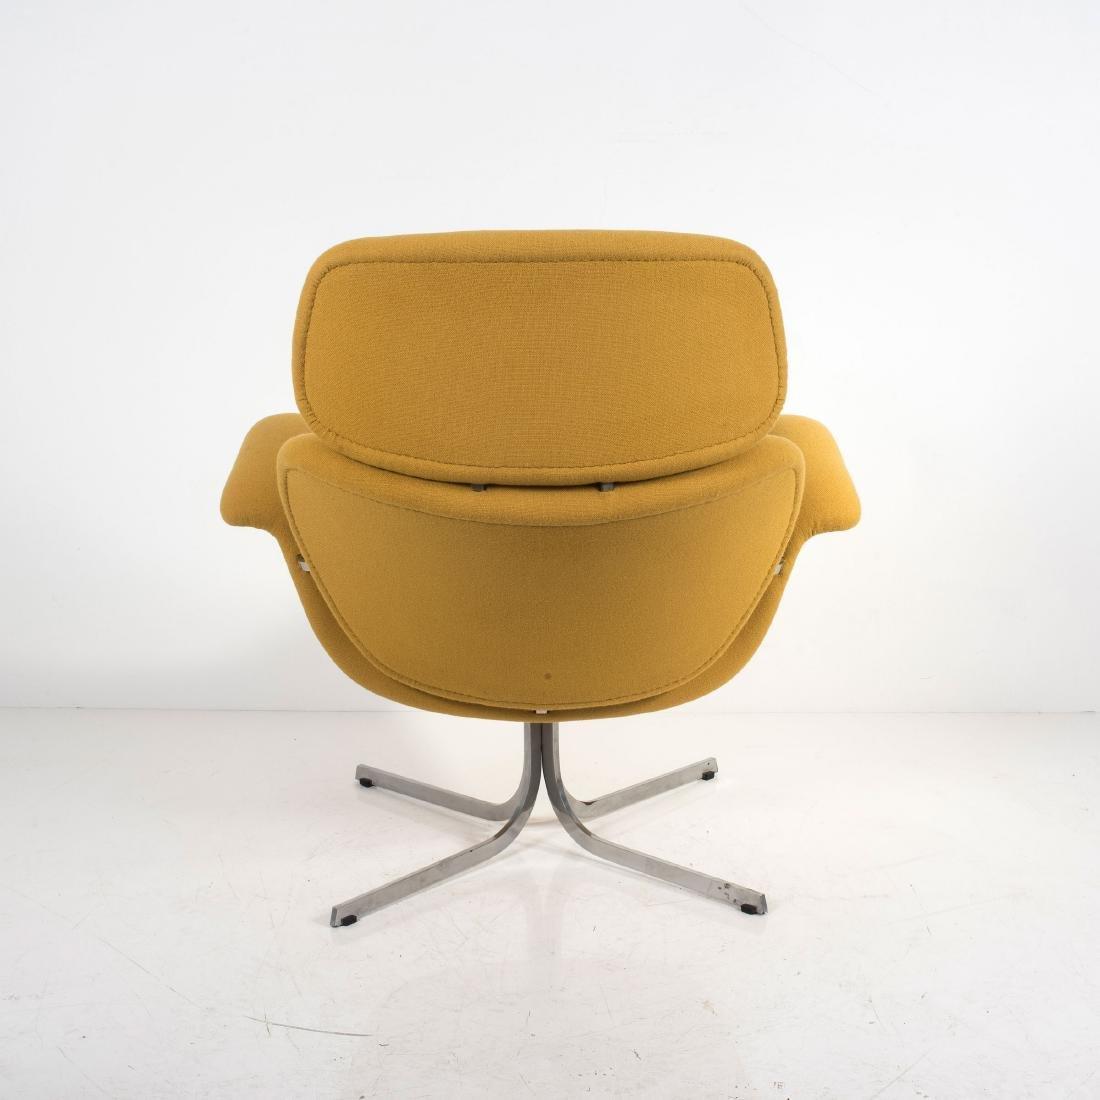 'F 545' - 'Big Tulip' easy chair, 1959 - 5